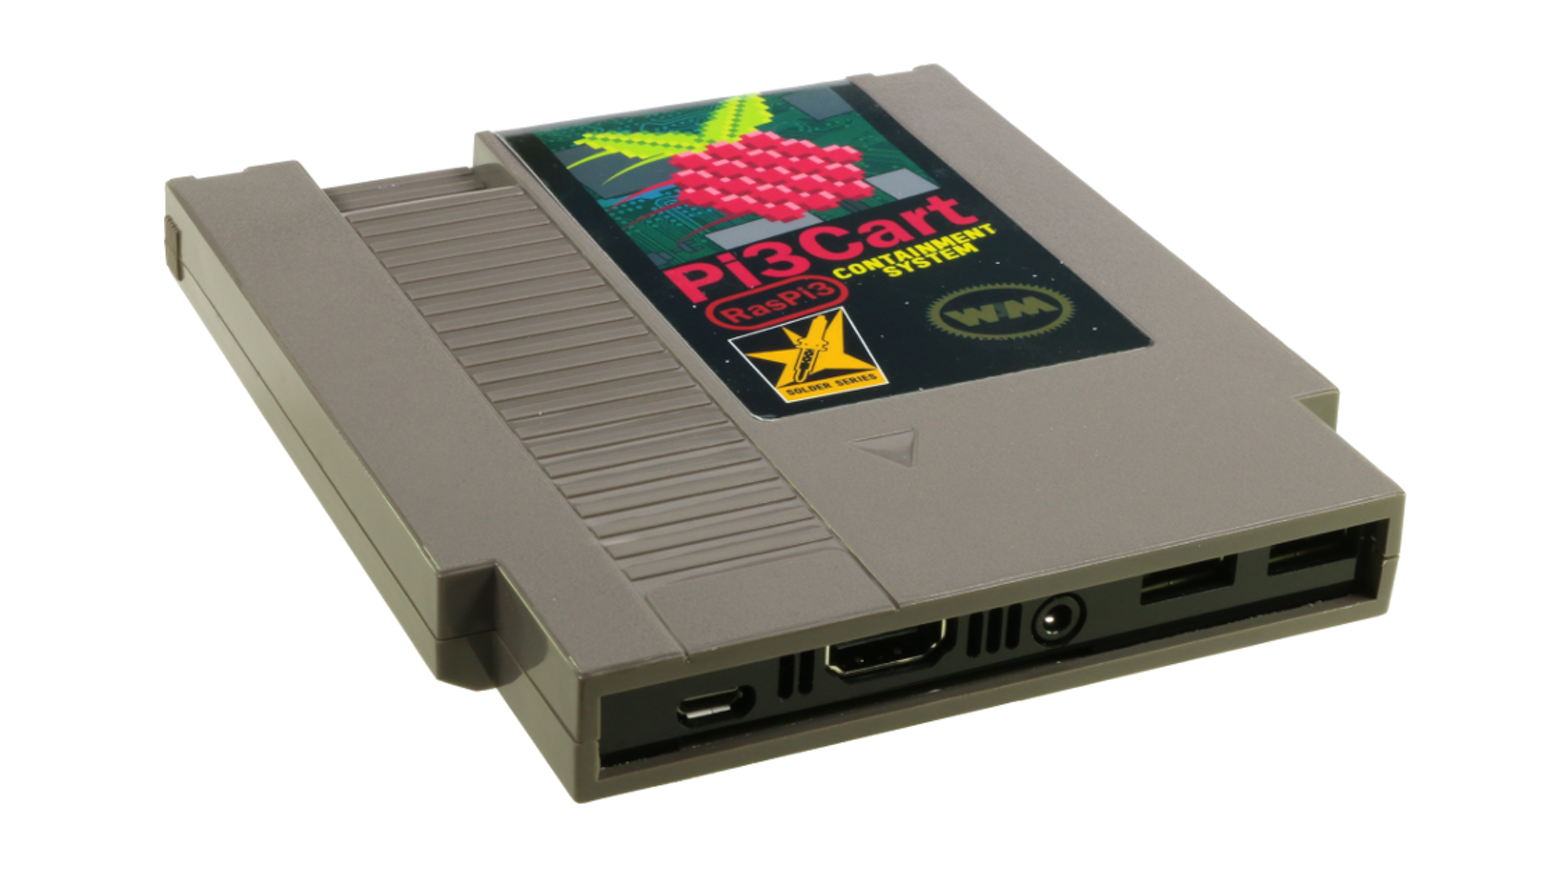 nintendo 64 emulator on raspberry pi 3